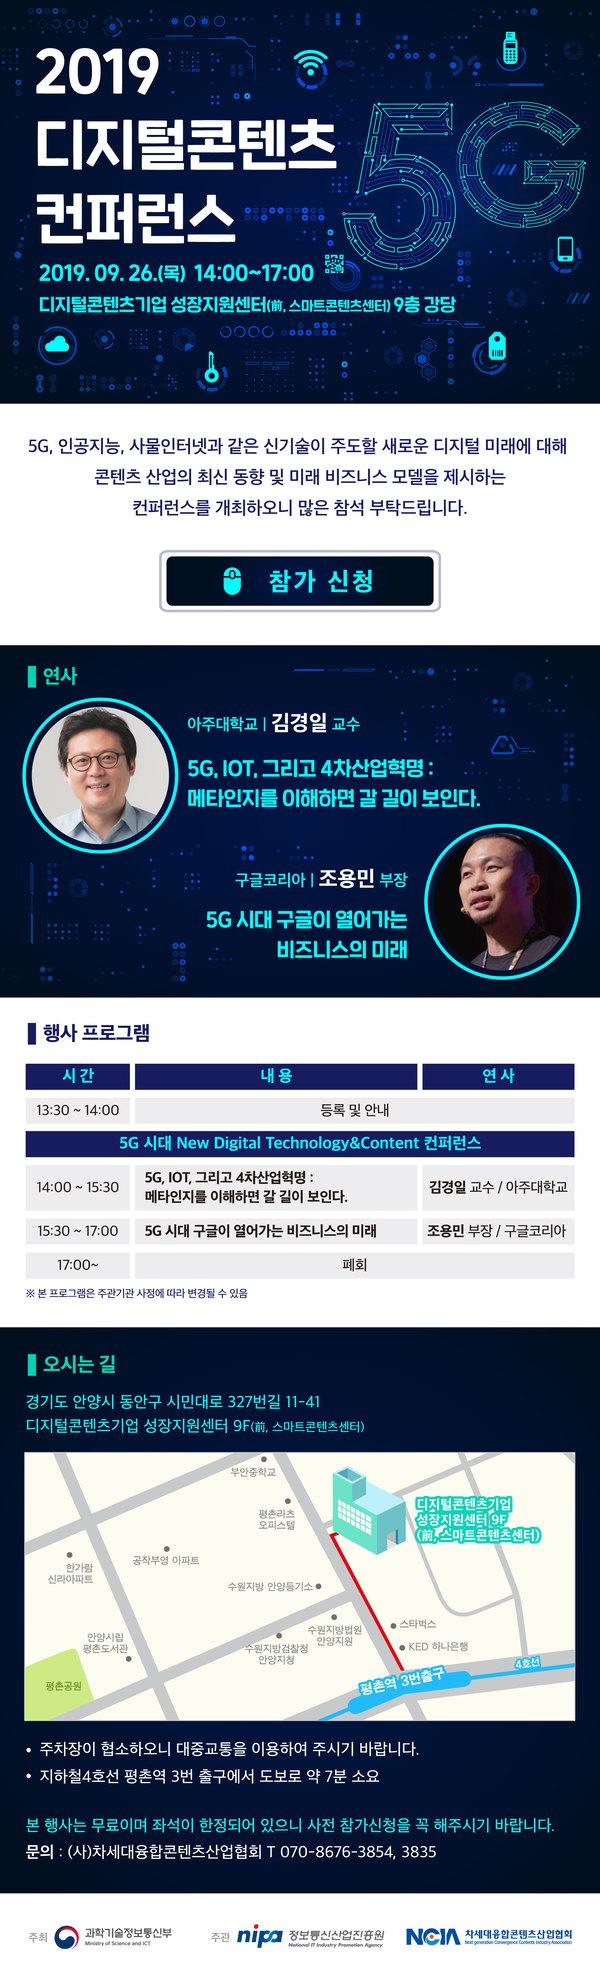 2019Dconference_edm.jpg